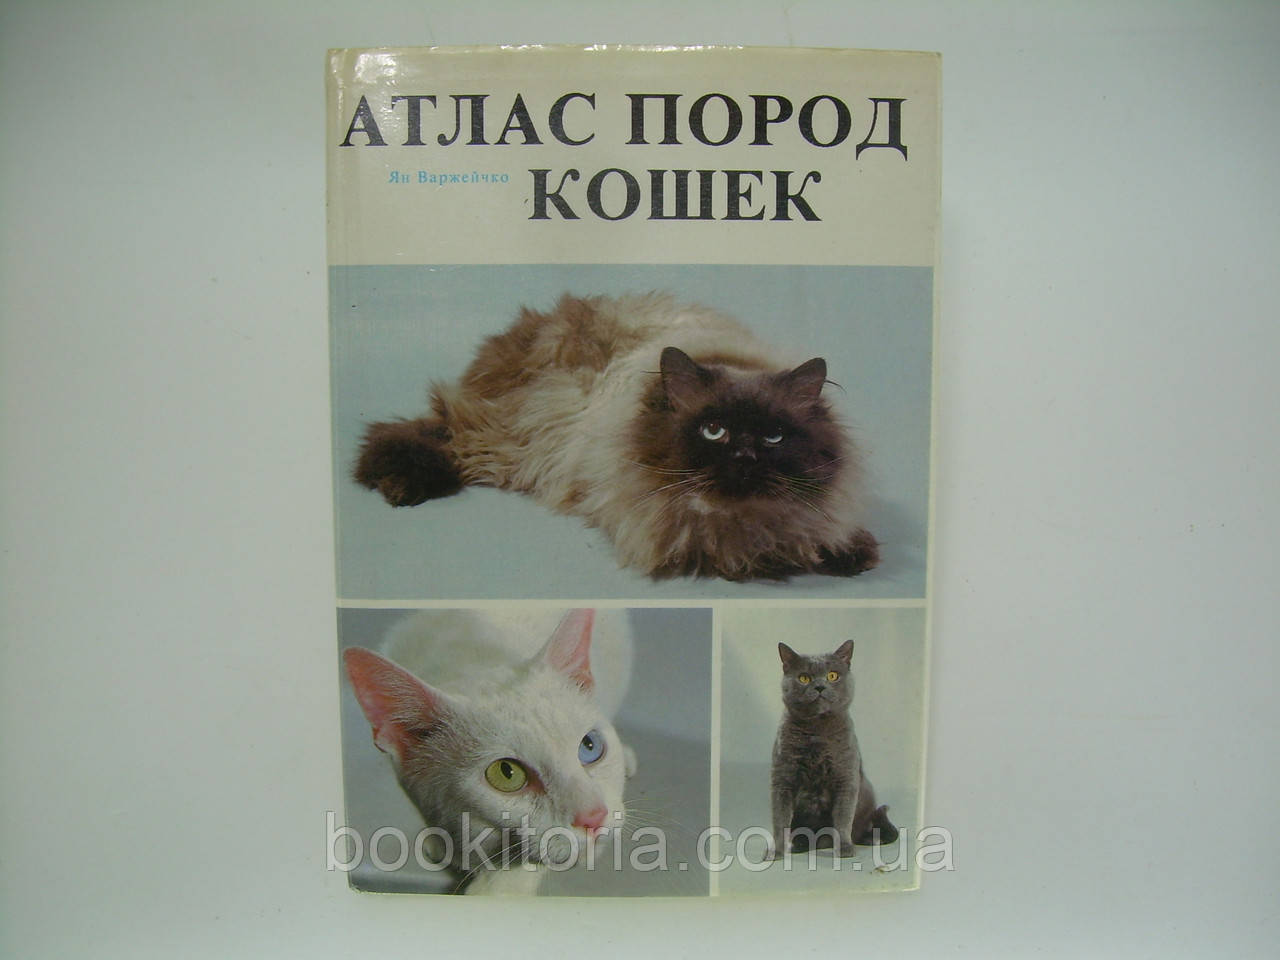 атлас пород кошек с фото